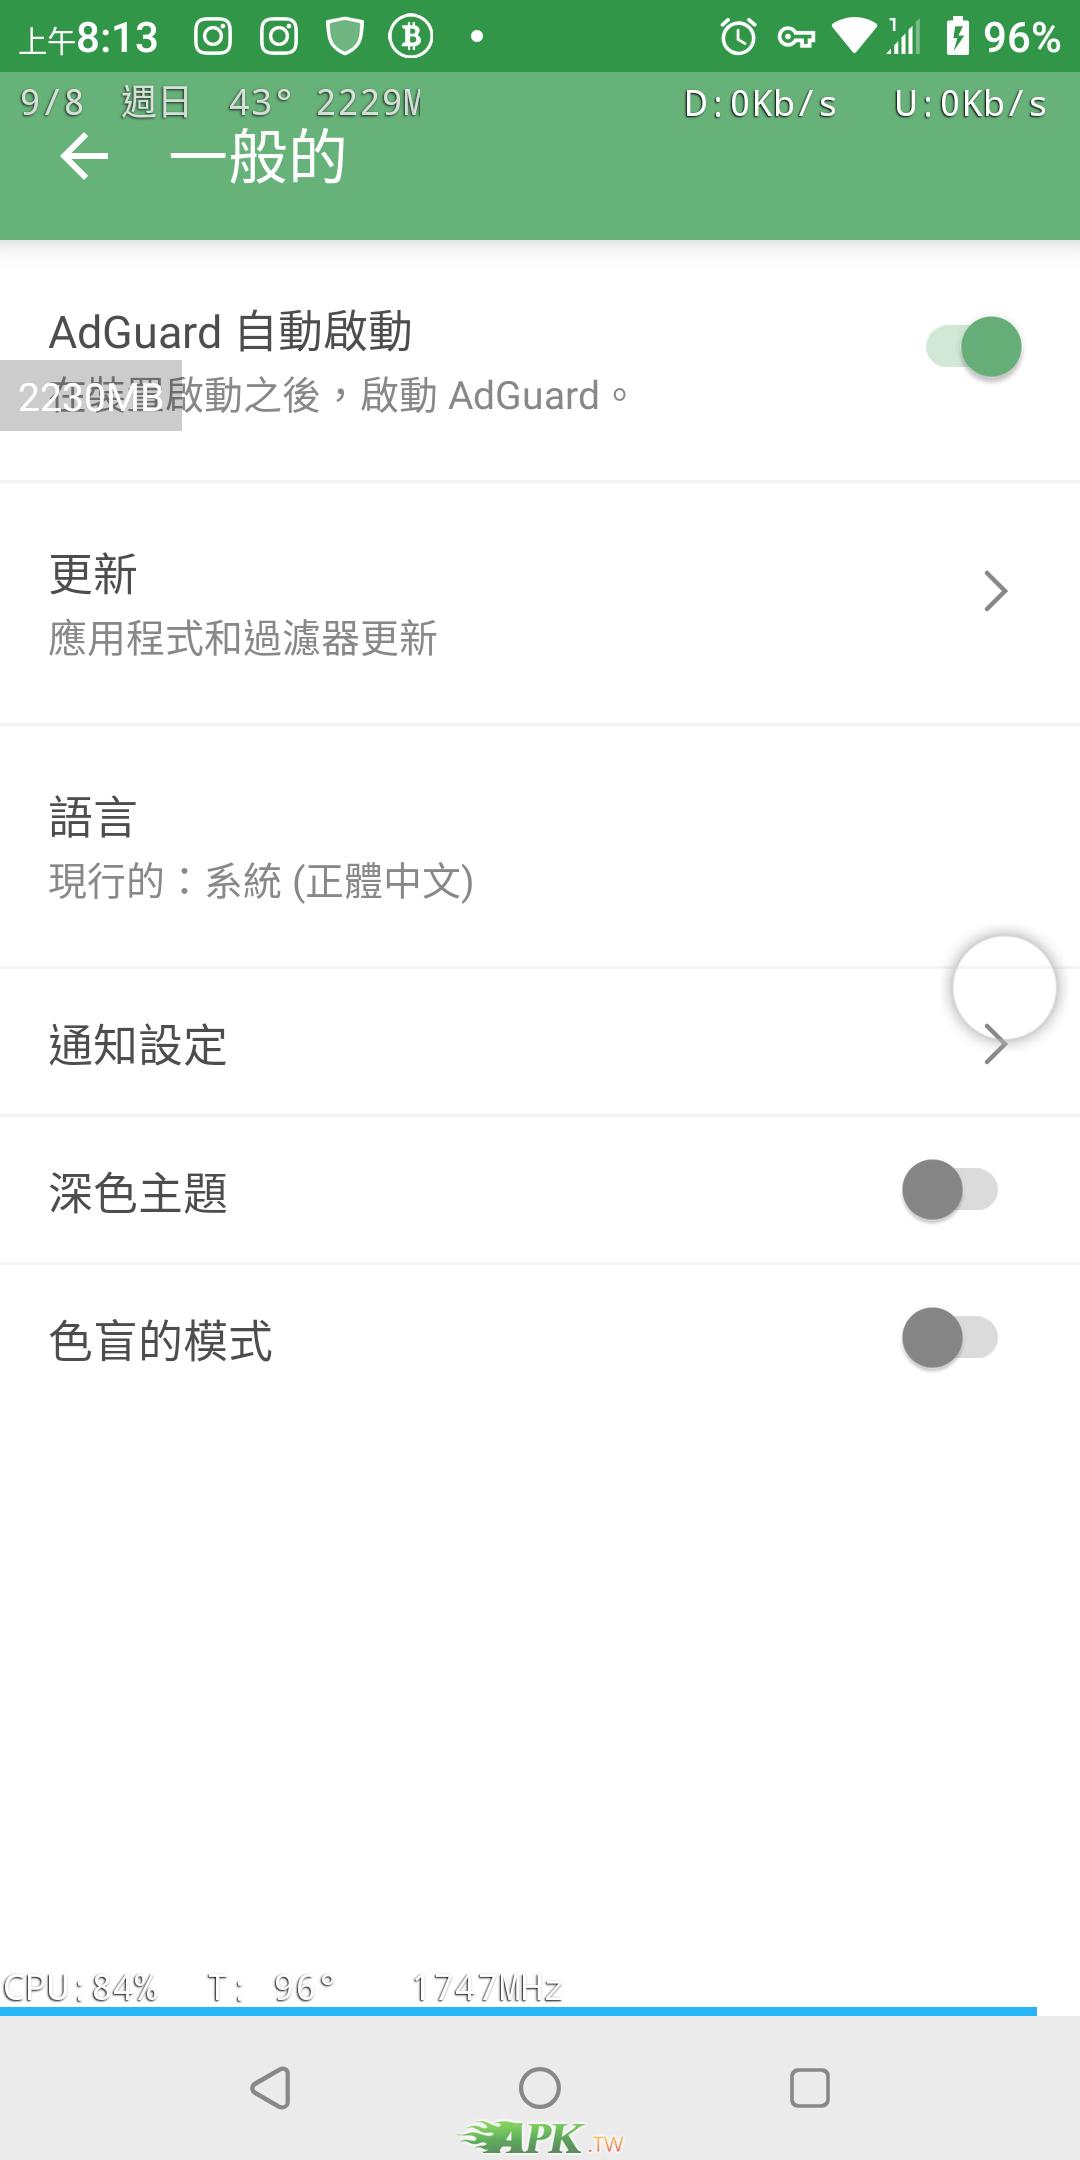 Screenshot_20190908-081319.png